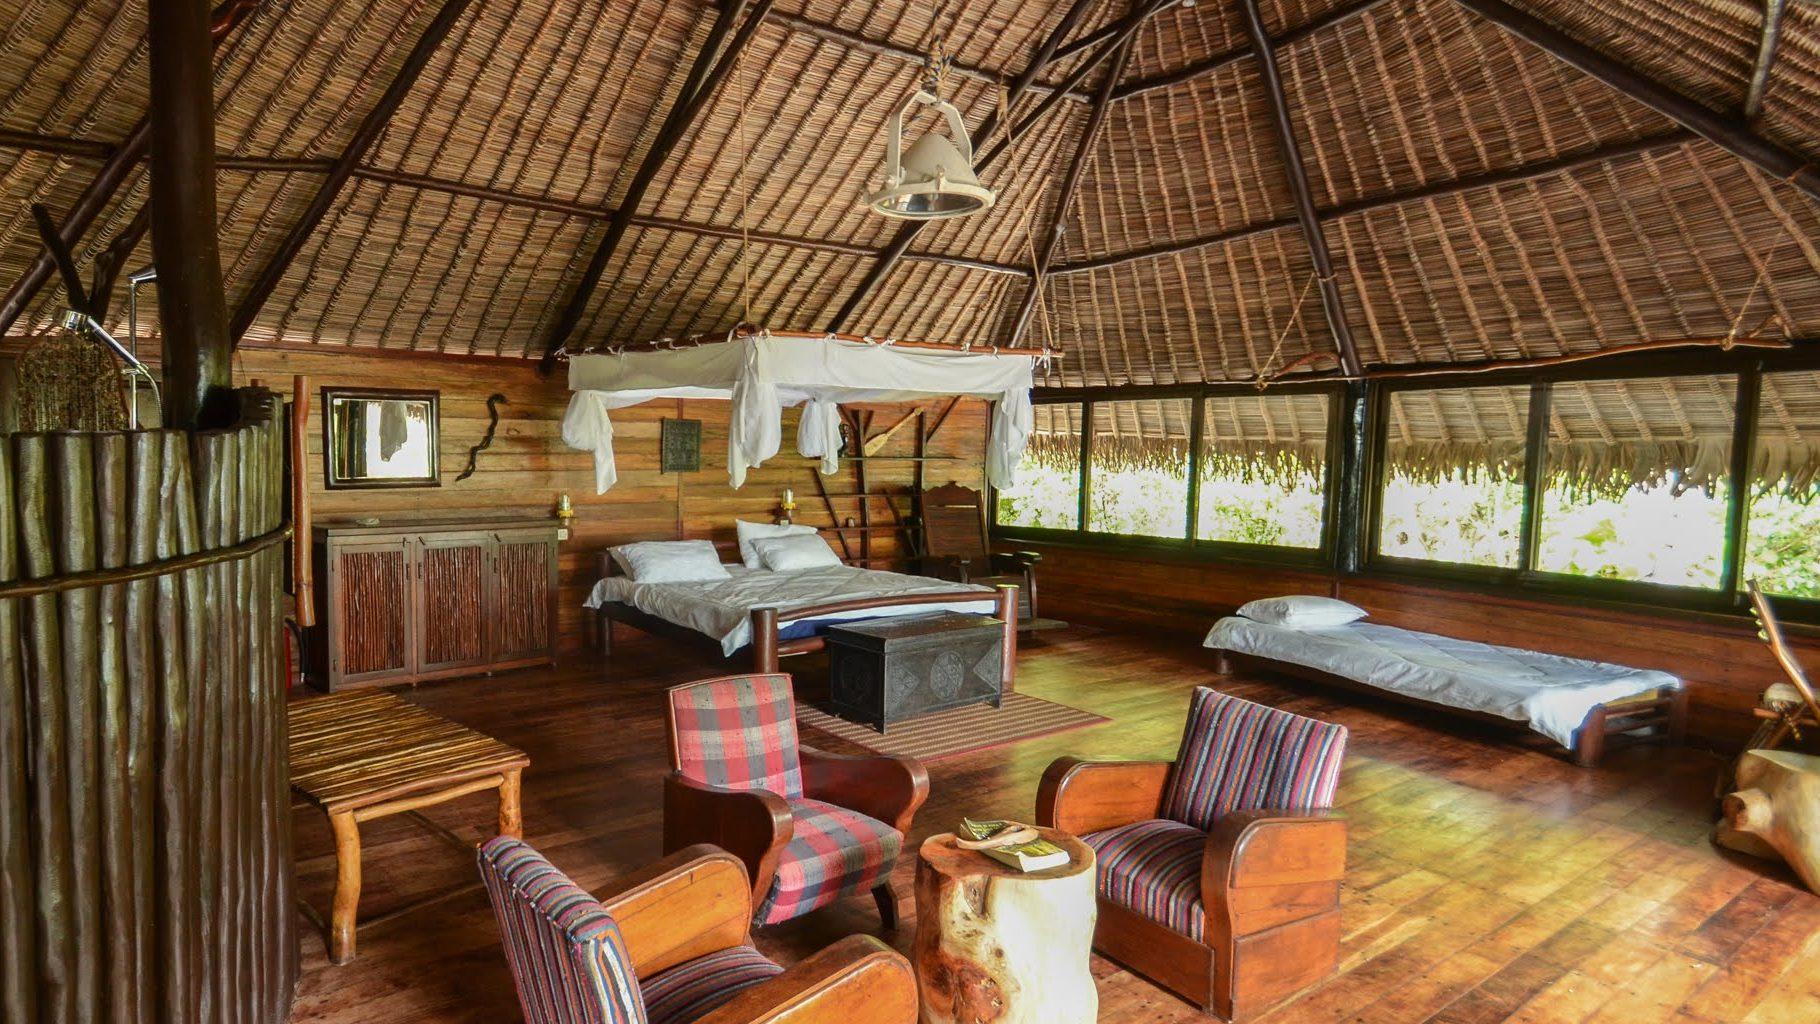 Manafiafy Bedroom South Madagascar